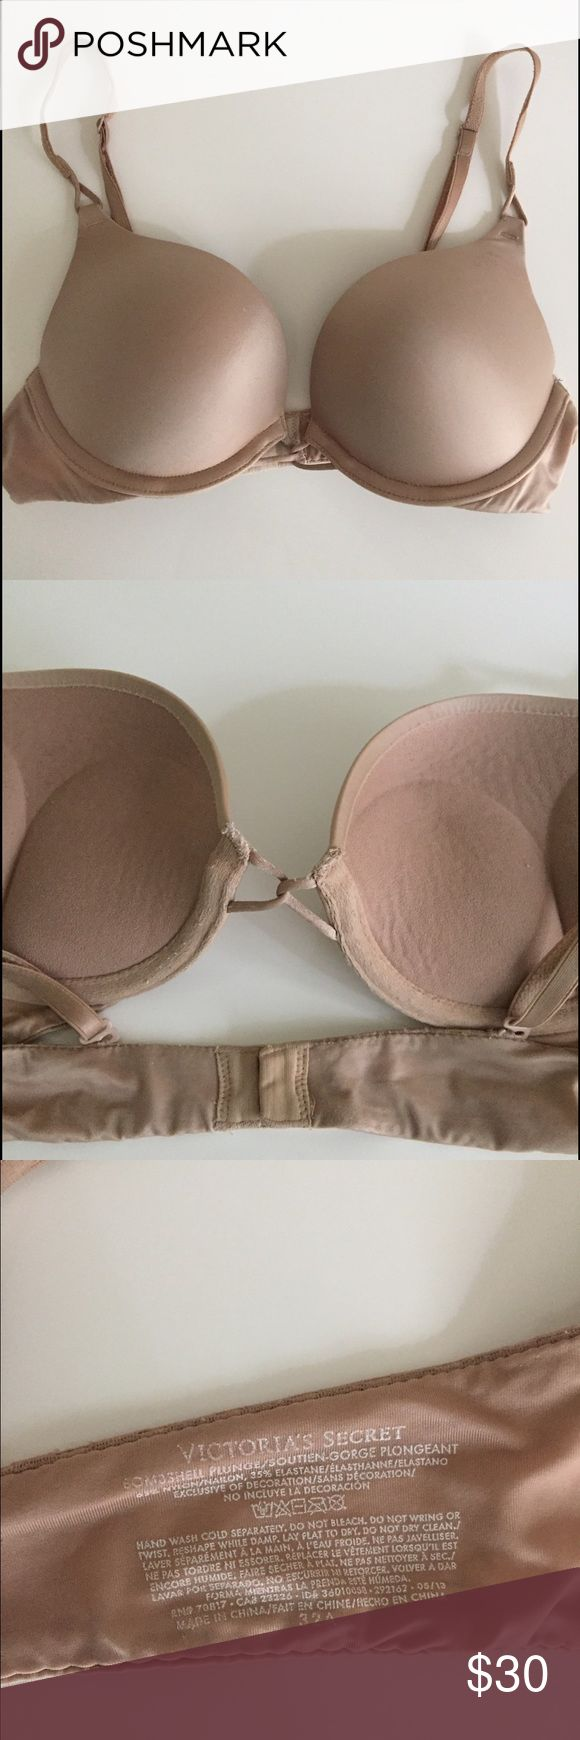 Victoria's Secret Bombshell bra Amazing push-up bra that adds 2 cups. Still in really good condition. Victoria's Secret Intimates & Sleepwear Bras